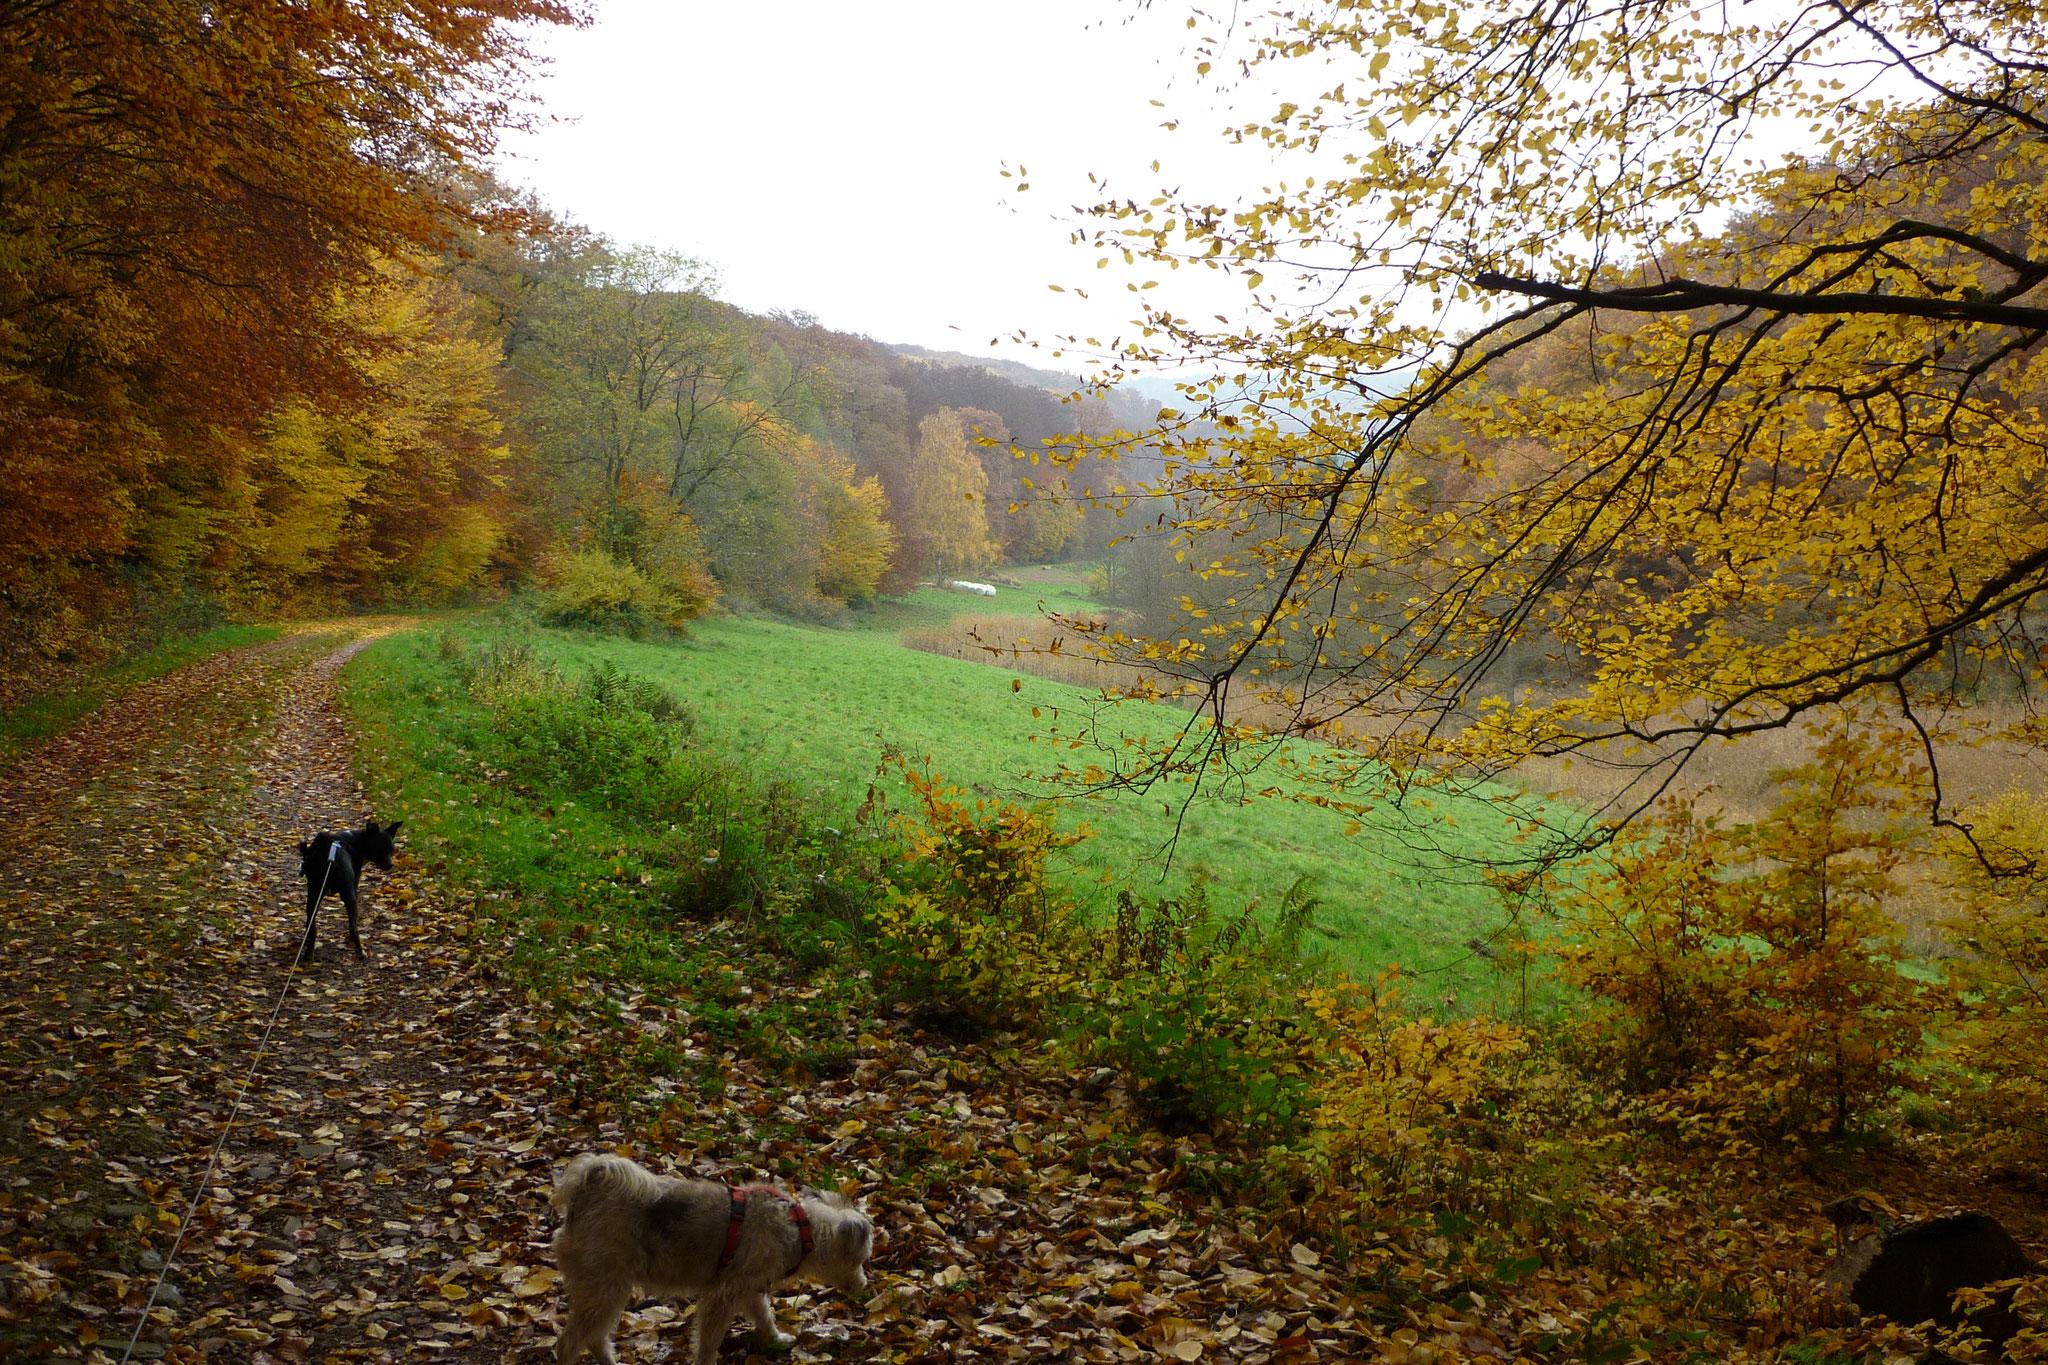 Herbst im Sülzbachtal